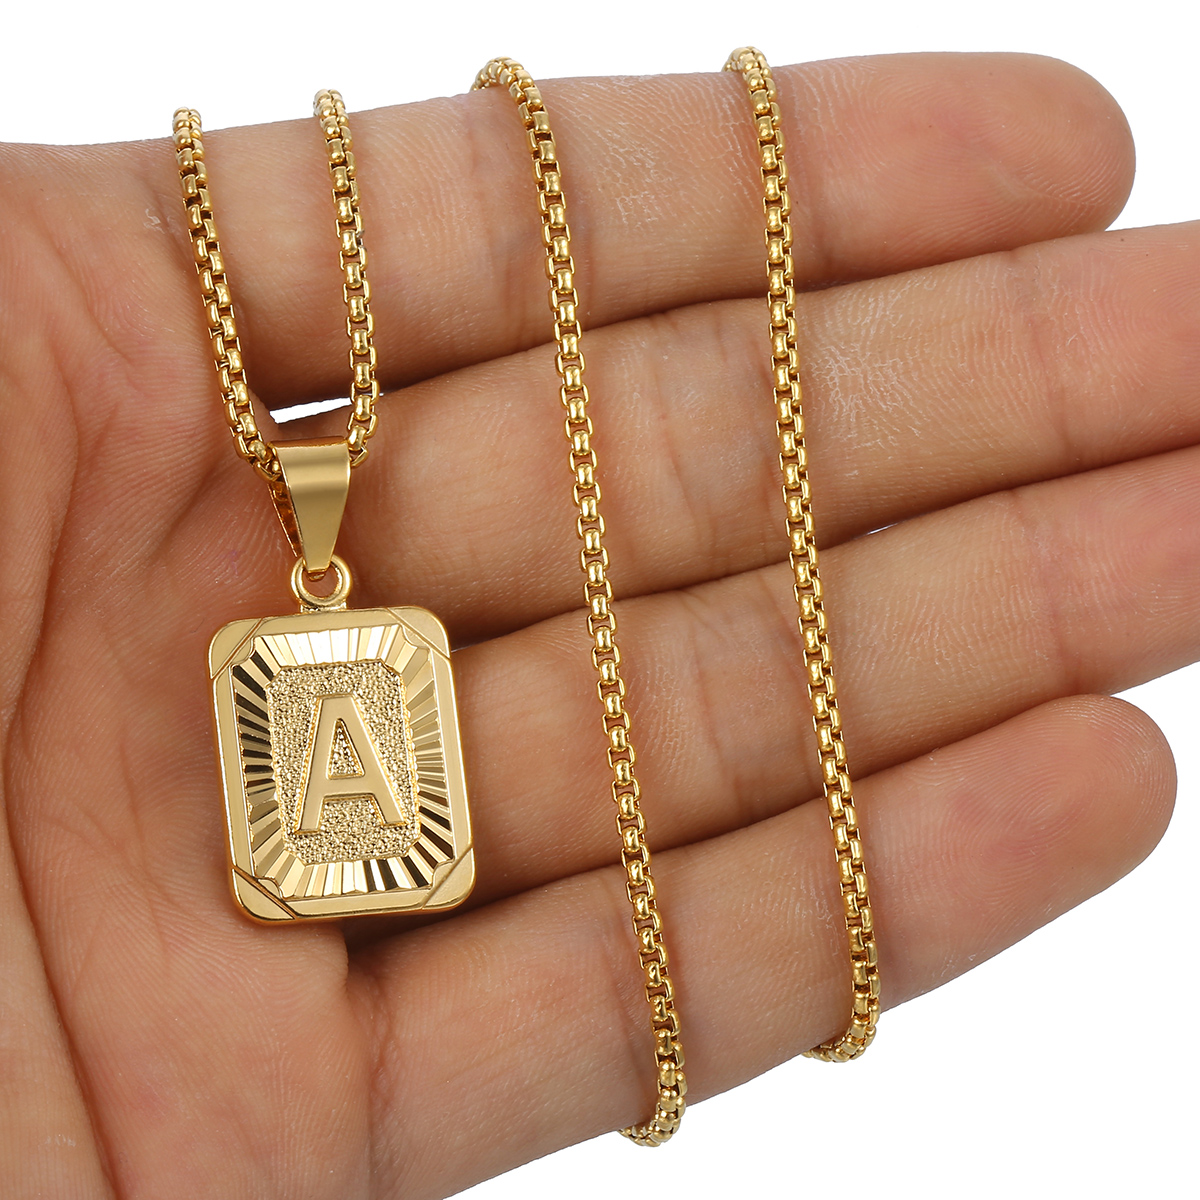 mens women chain pendant necklace gold filled square. Black Bedroom Furniture Sets. Home Design Ideas